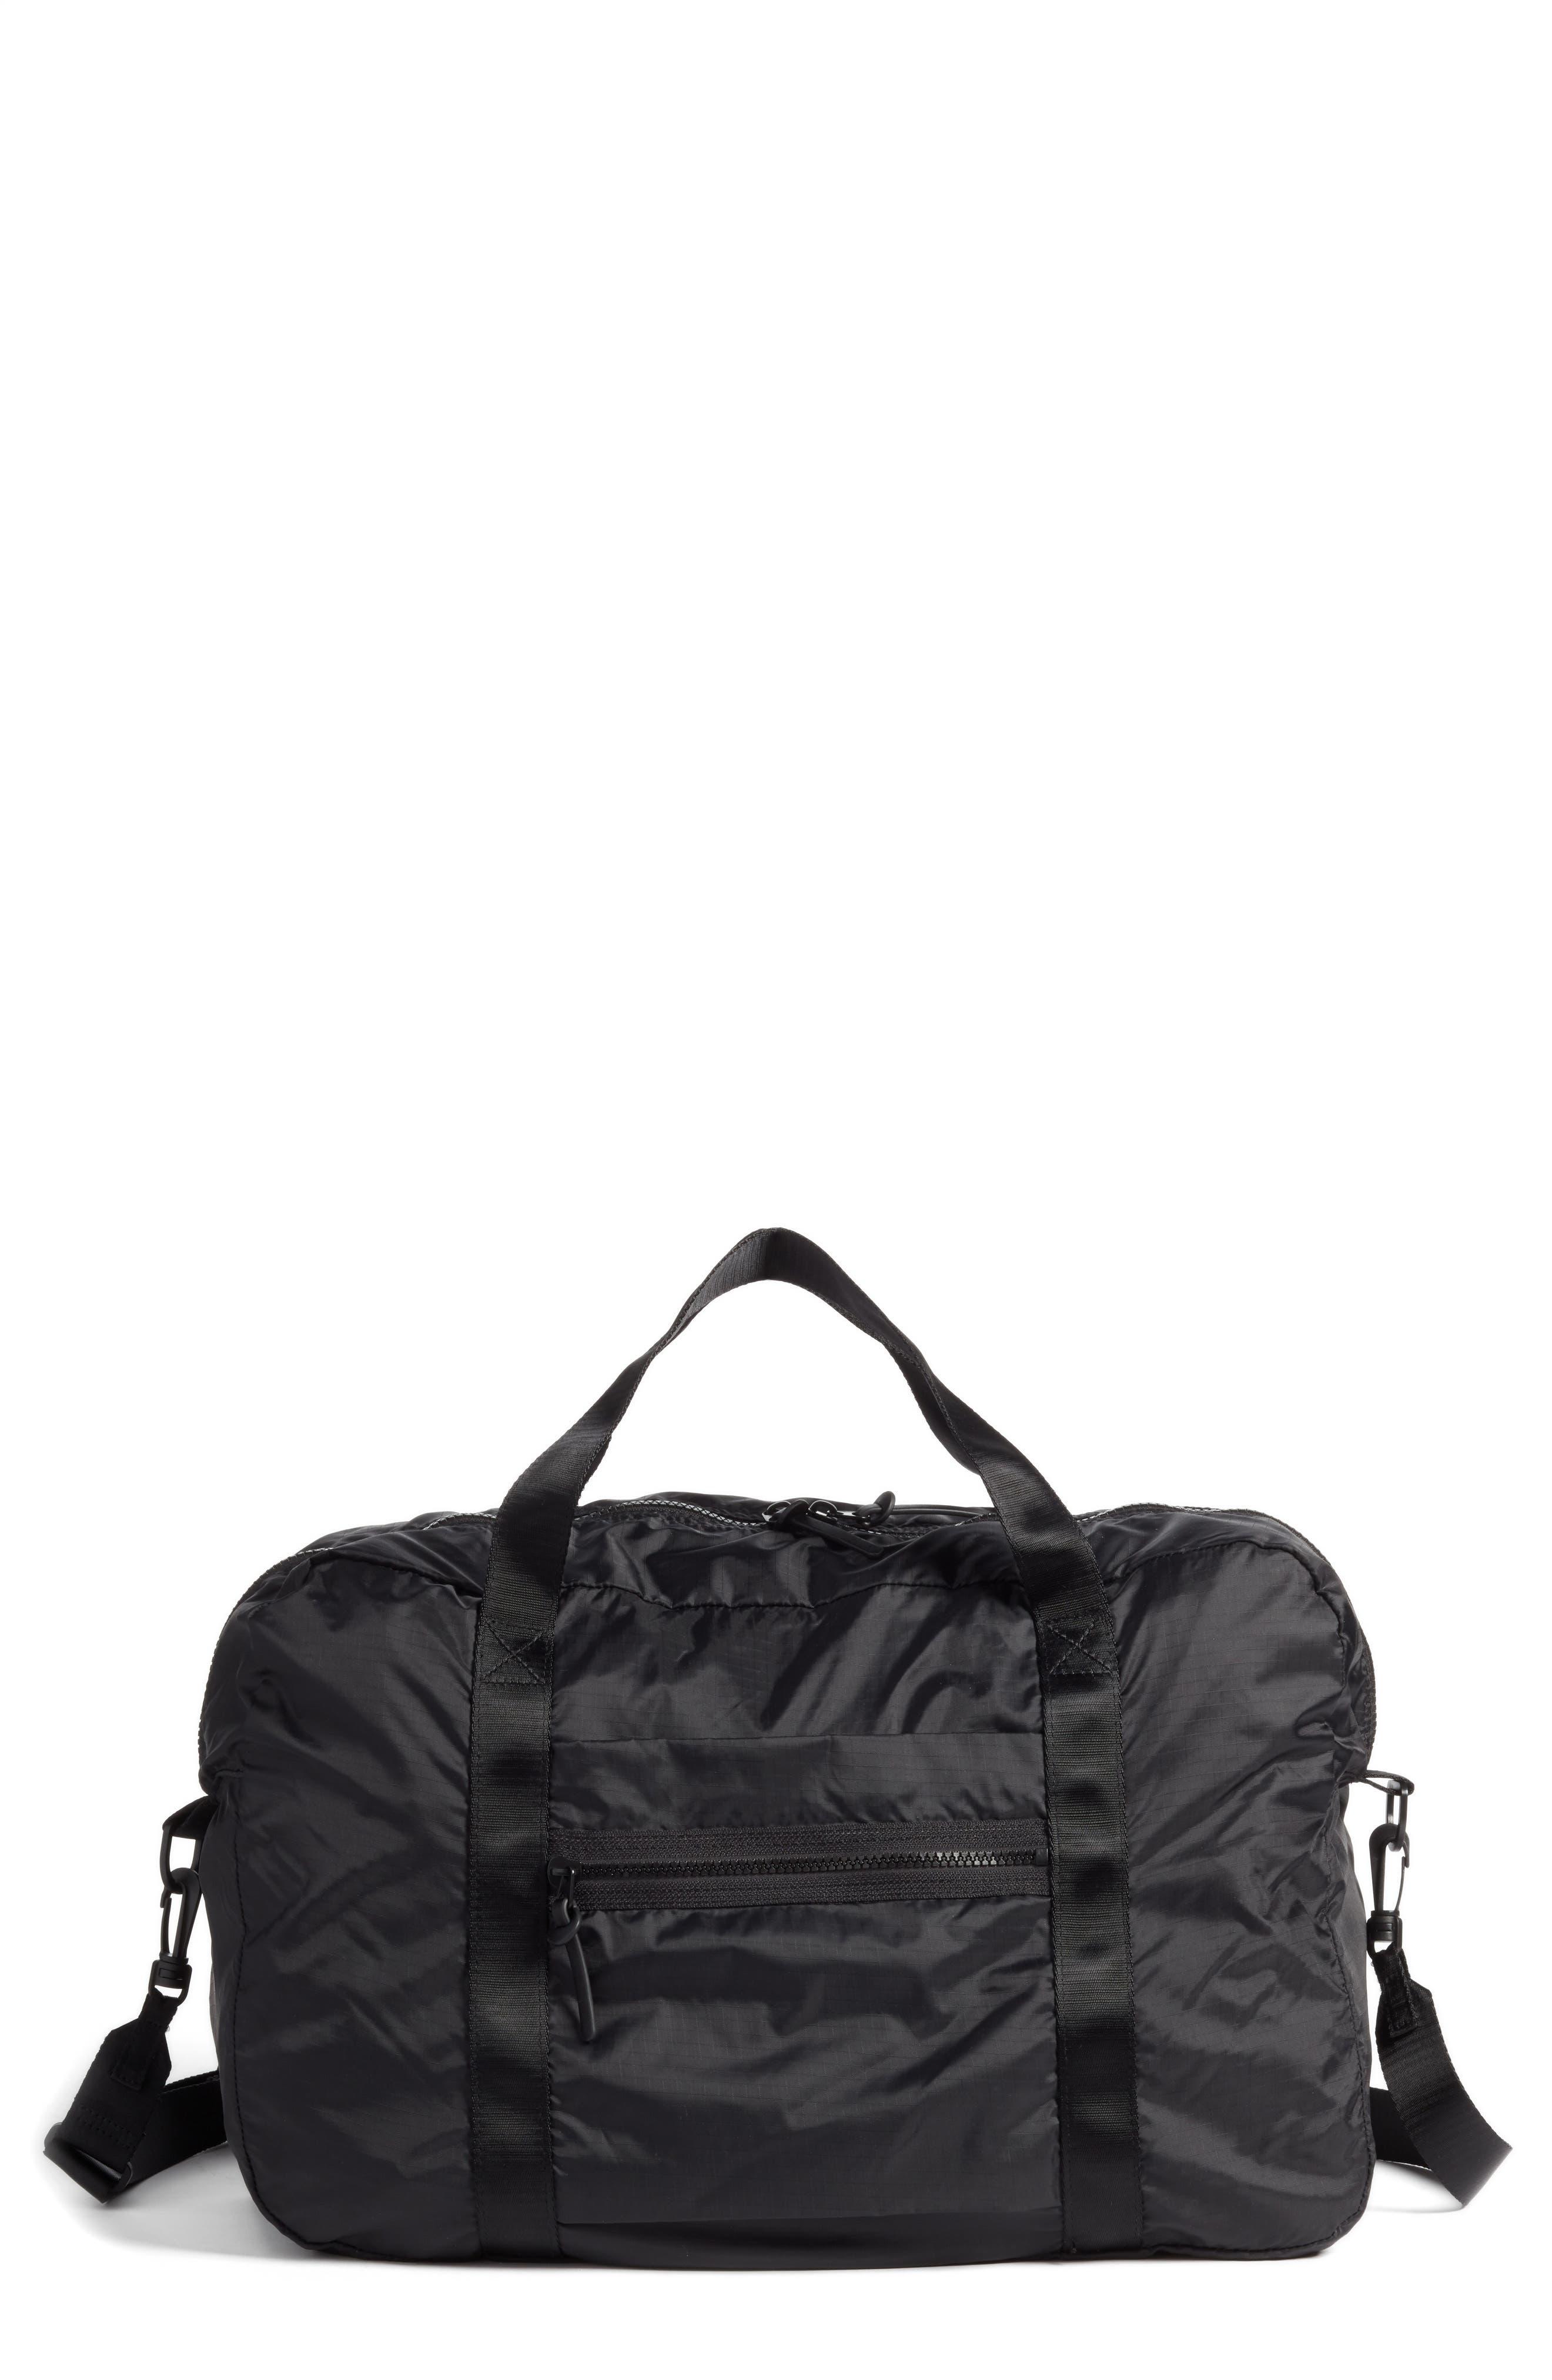 NORDSTROM Packable Nylon Duffel Bag, Main, color, BLACK